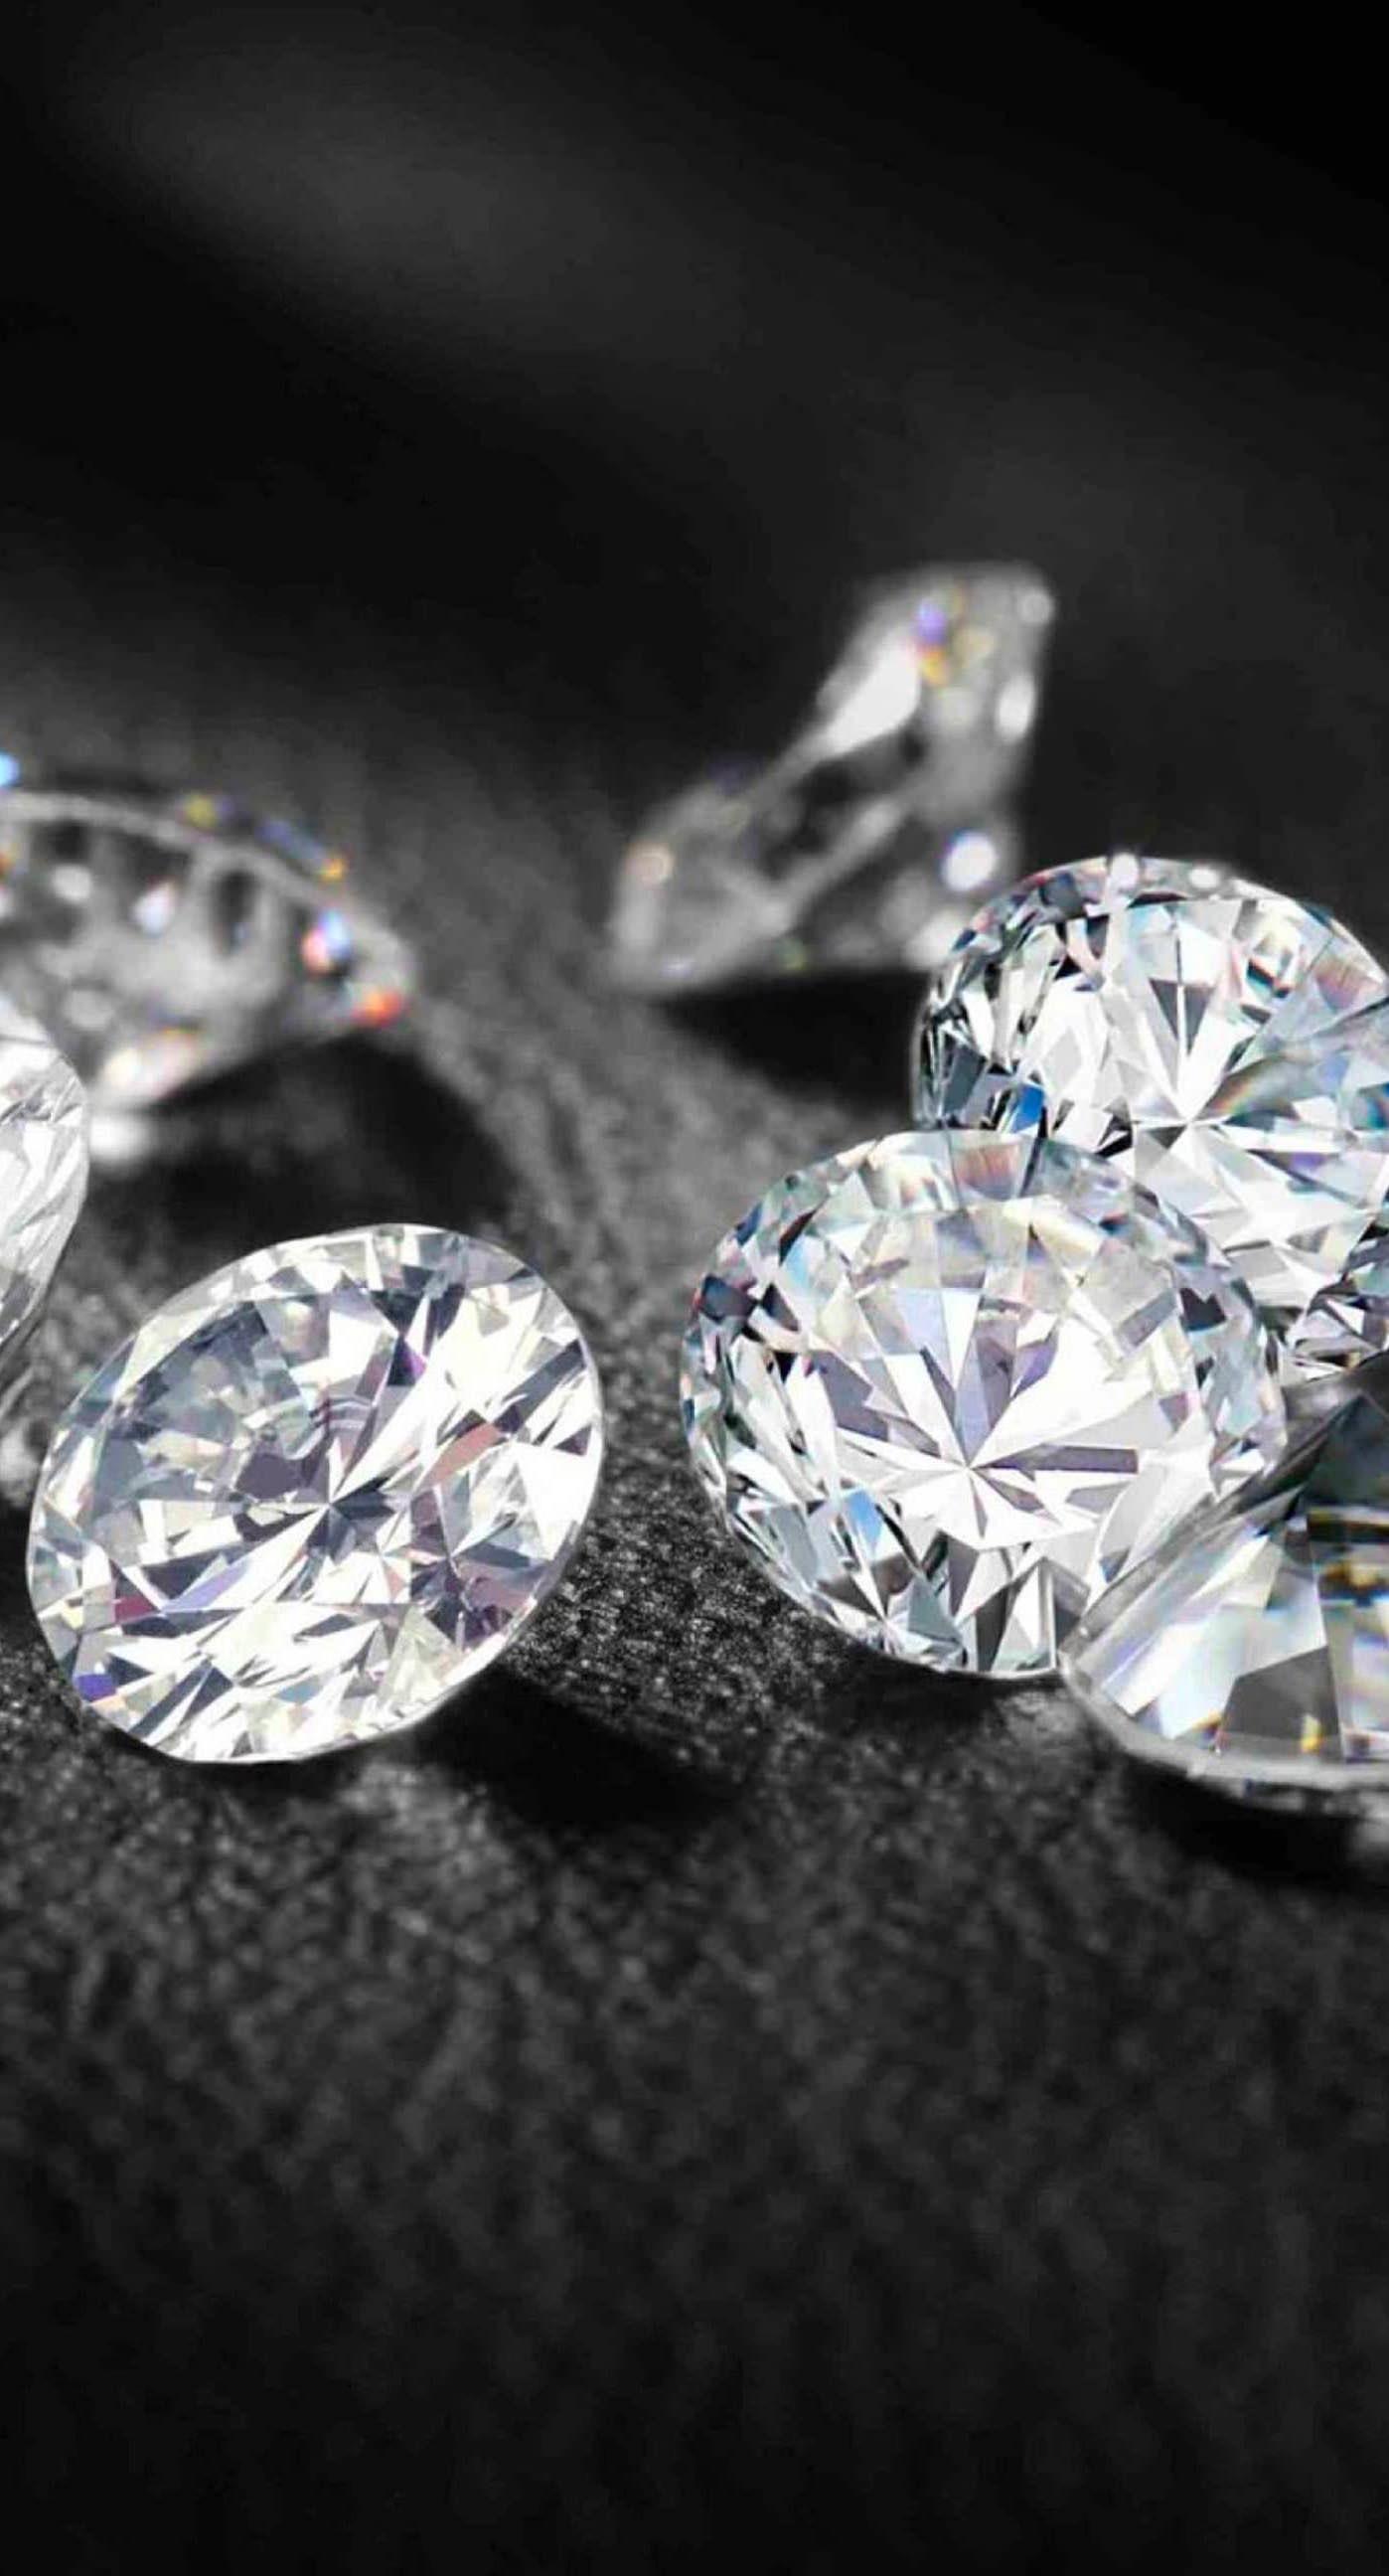 Iphone Wallpaper In 2019 Diamond Custom Jewelry Clean